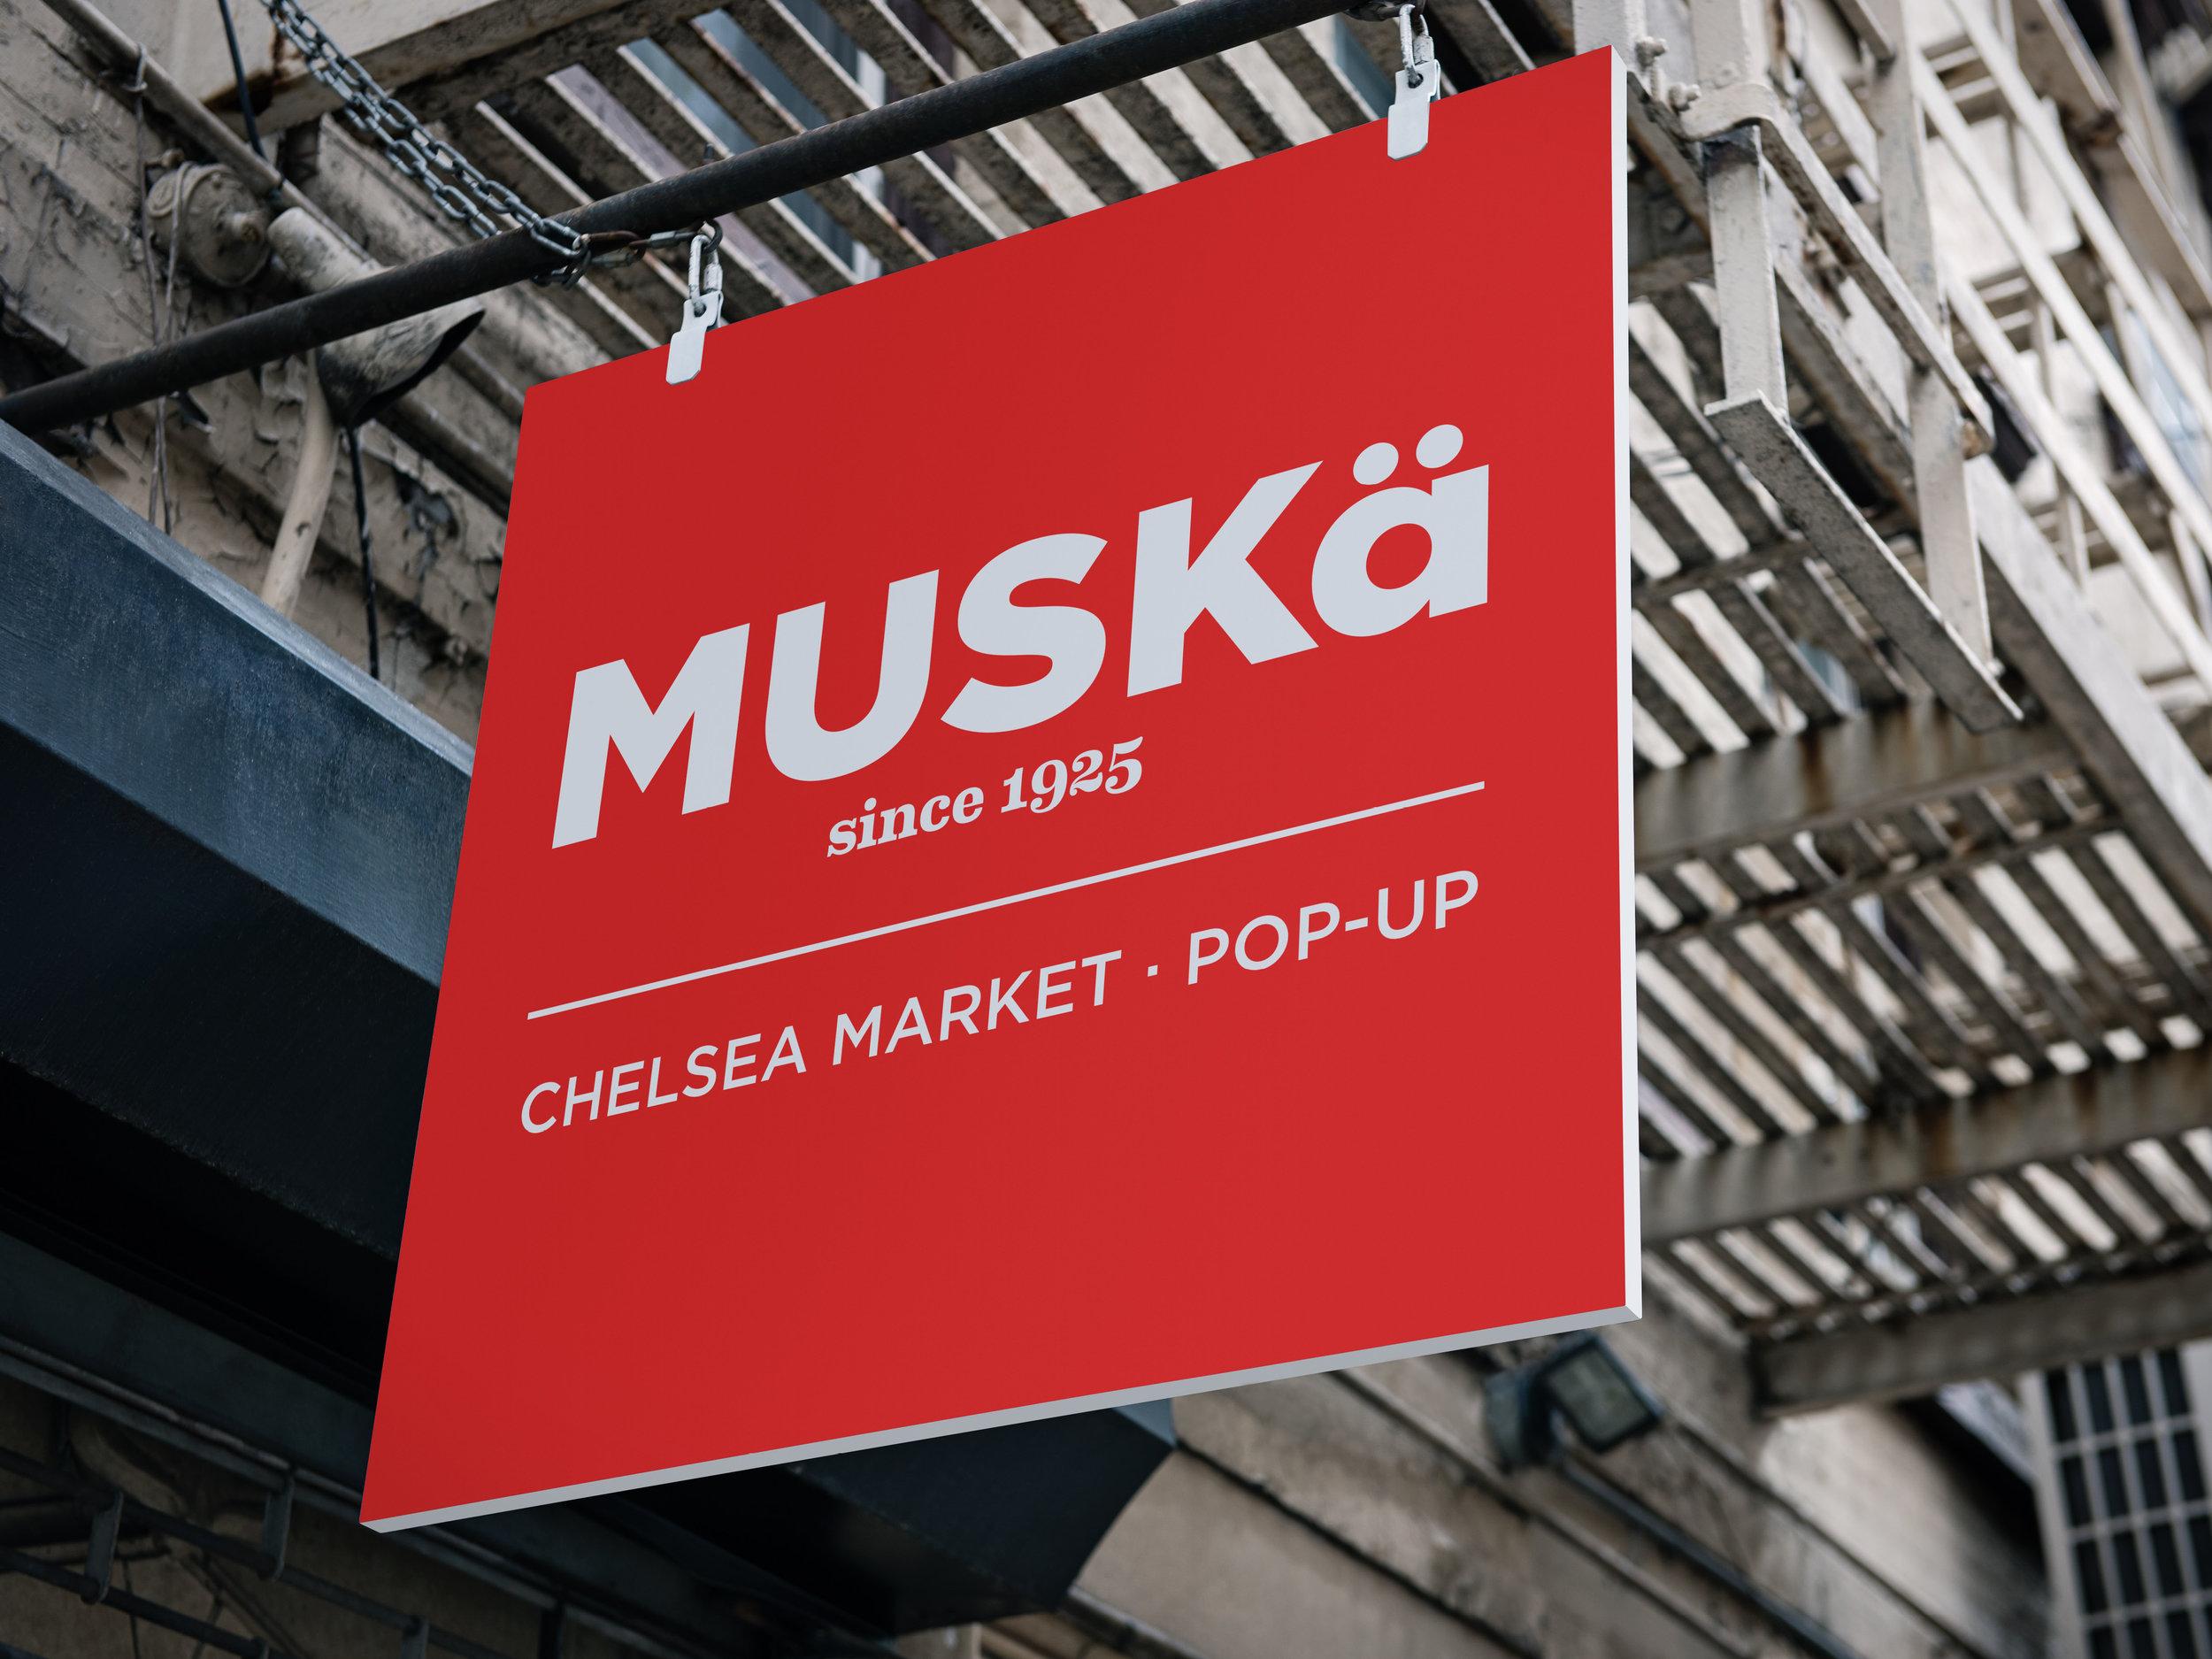 muska_portfolio_201912.jpg